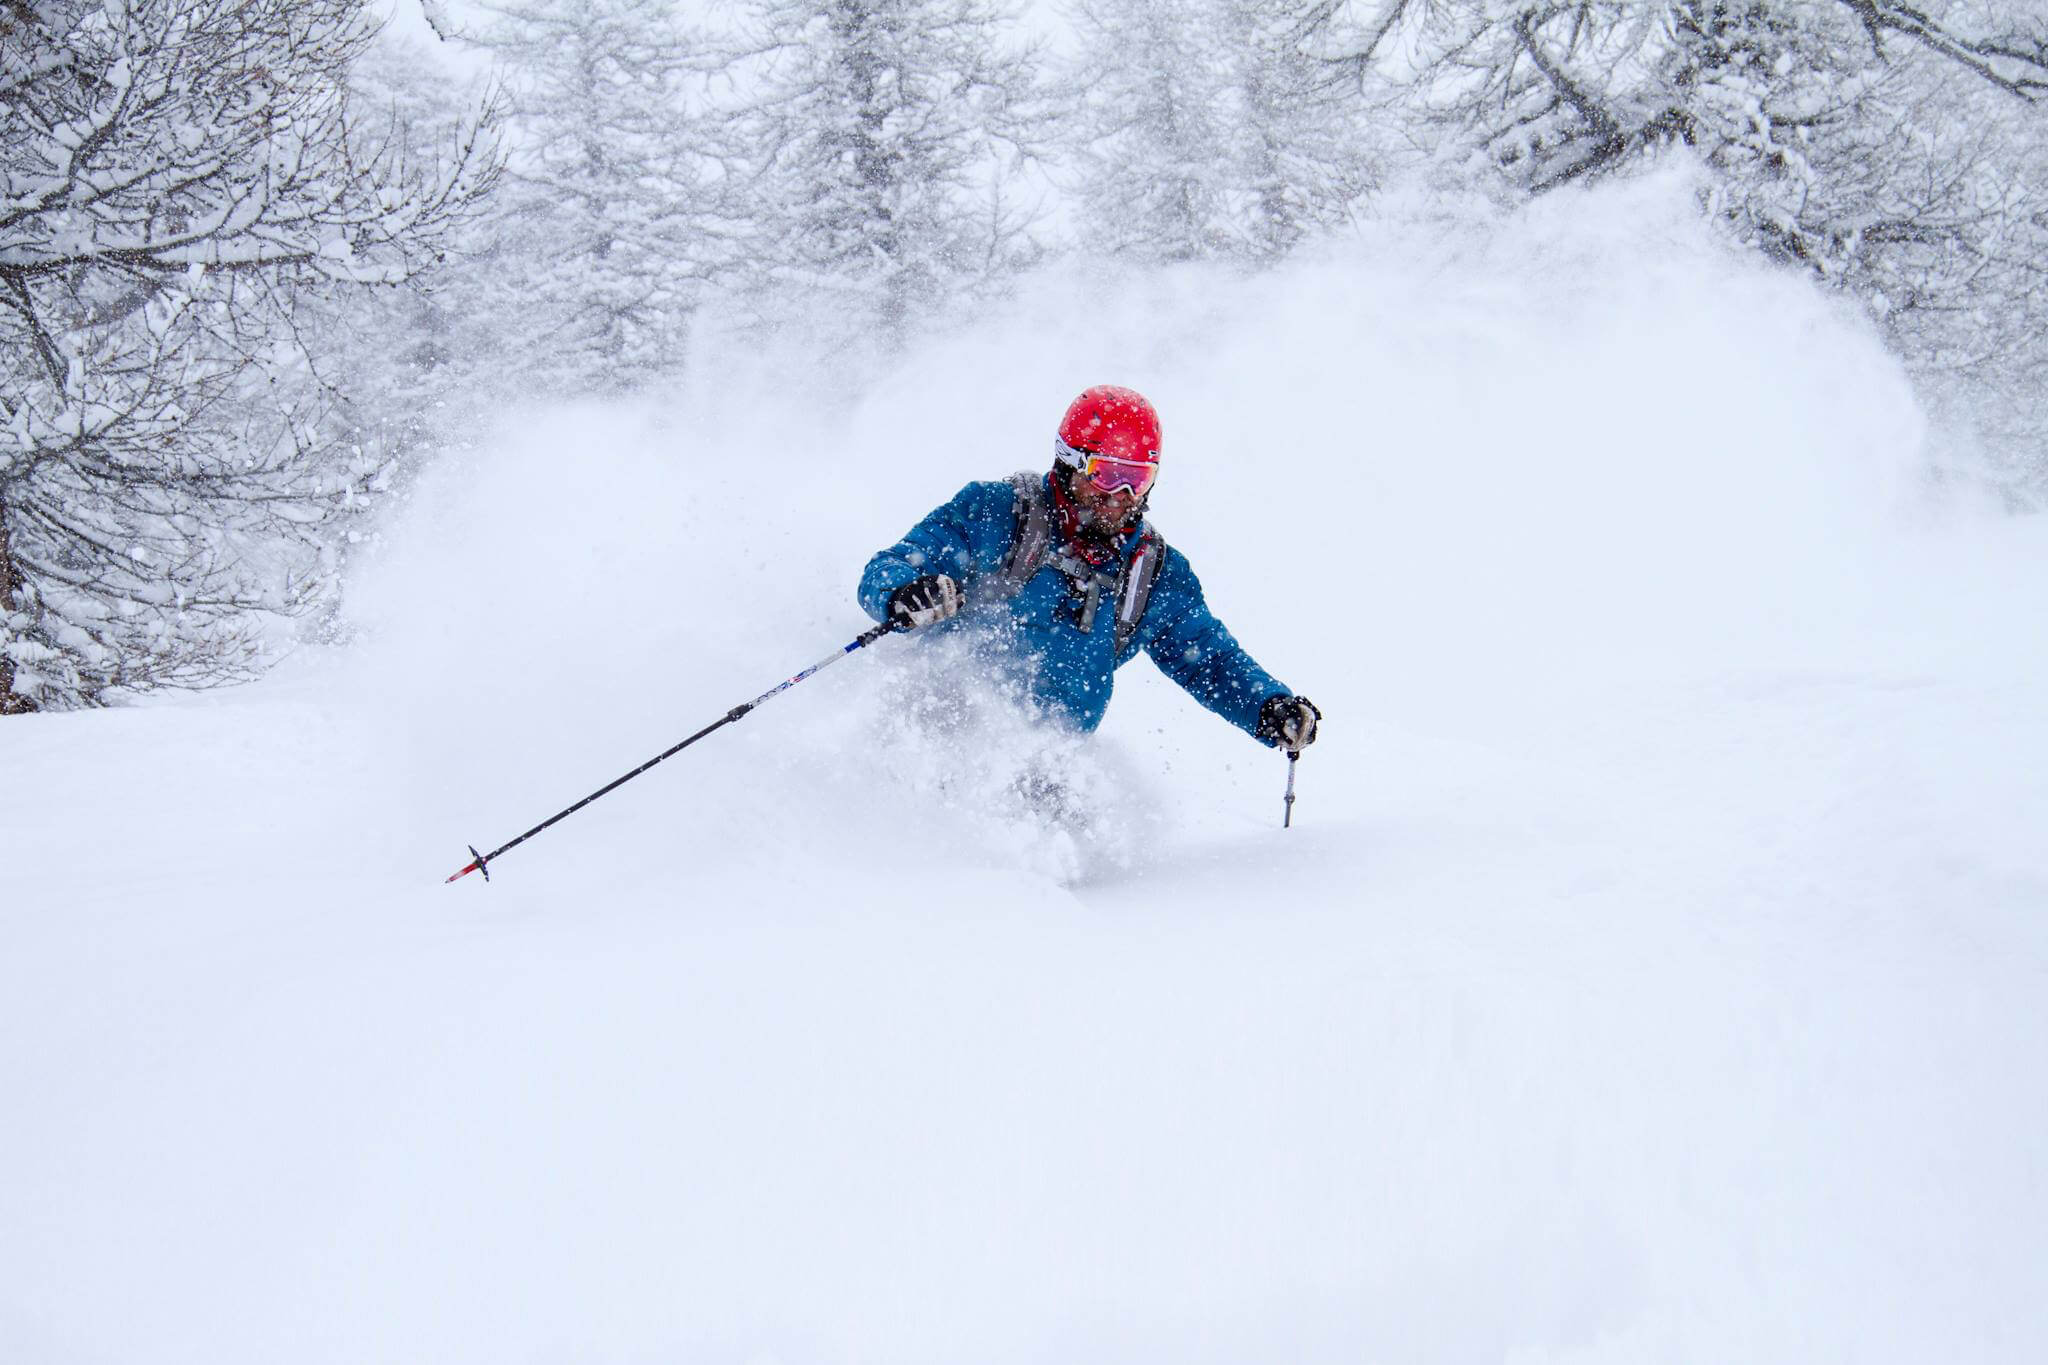 Magnus Lindor Strand skiing